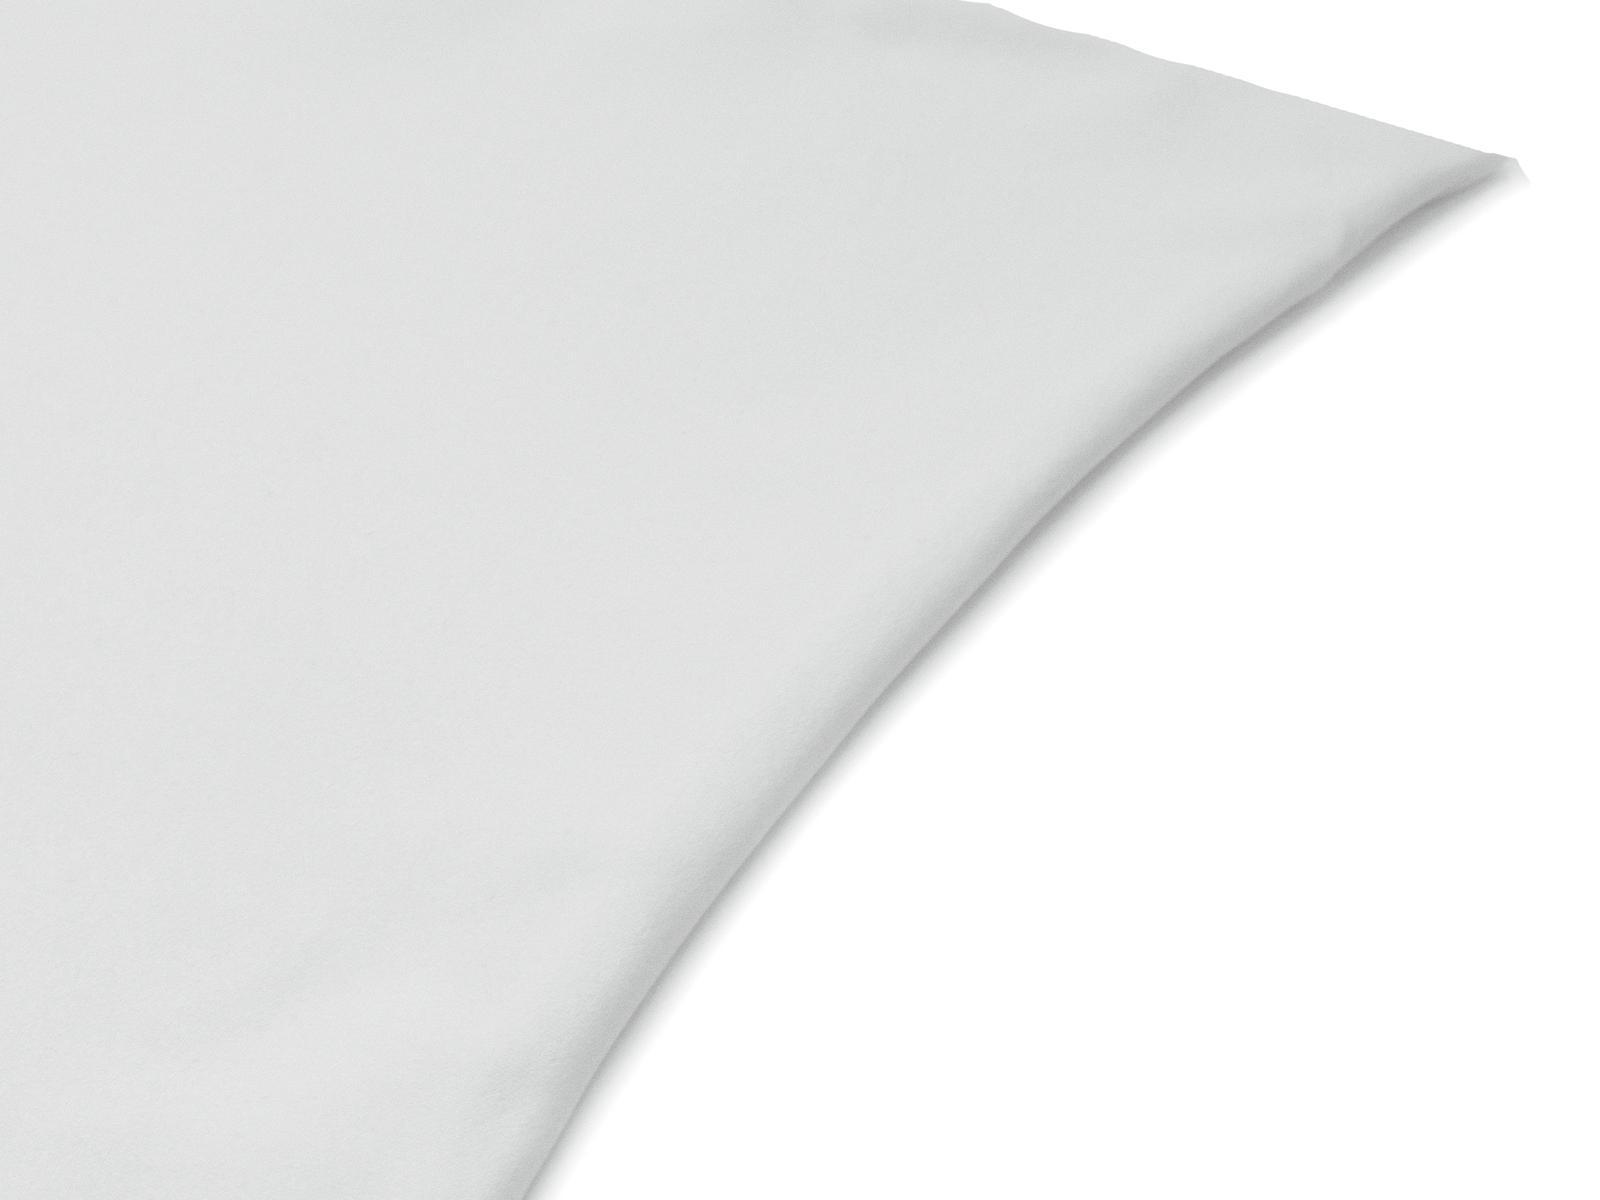 ESPANDERE BATC2W Trusscover 2m bianco